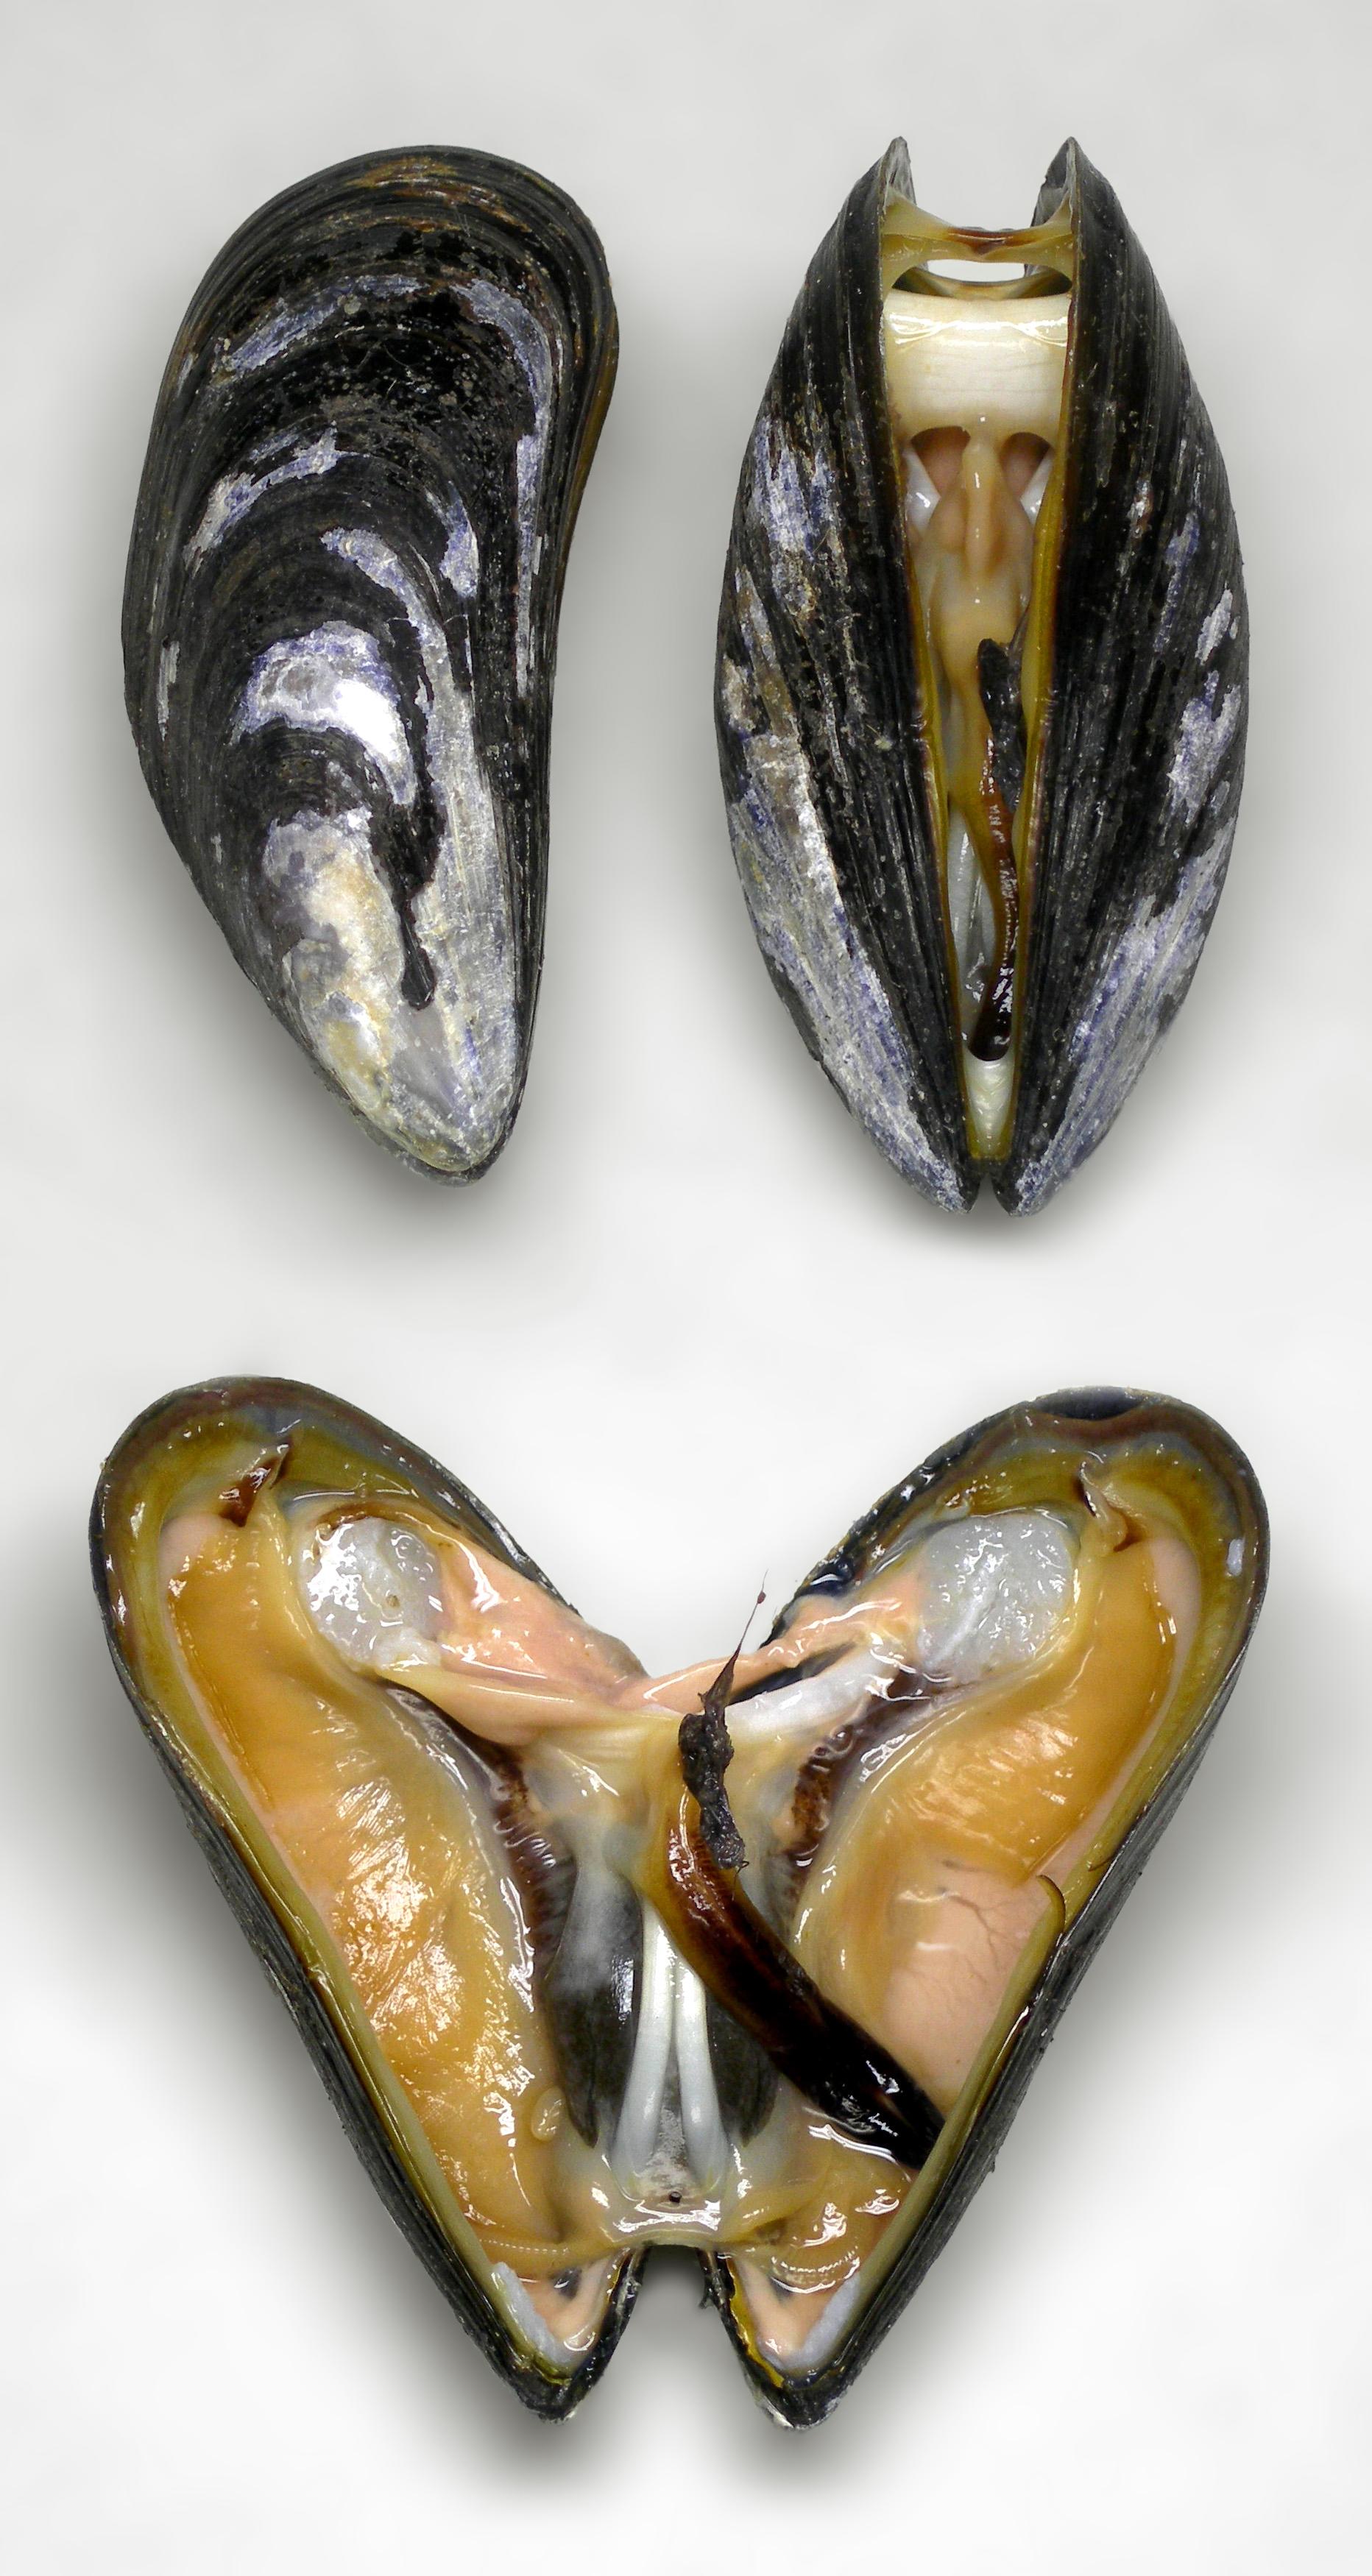 Mussel - Wikipedia